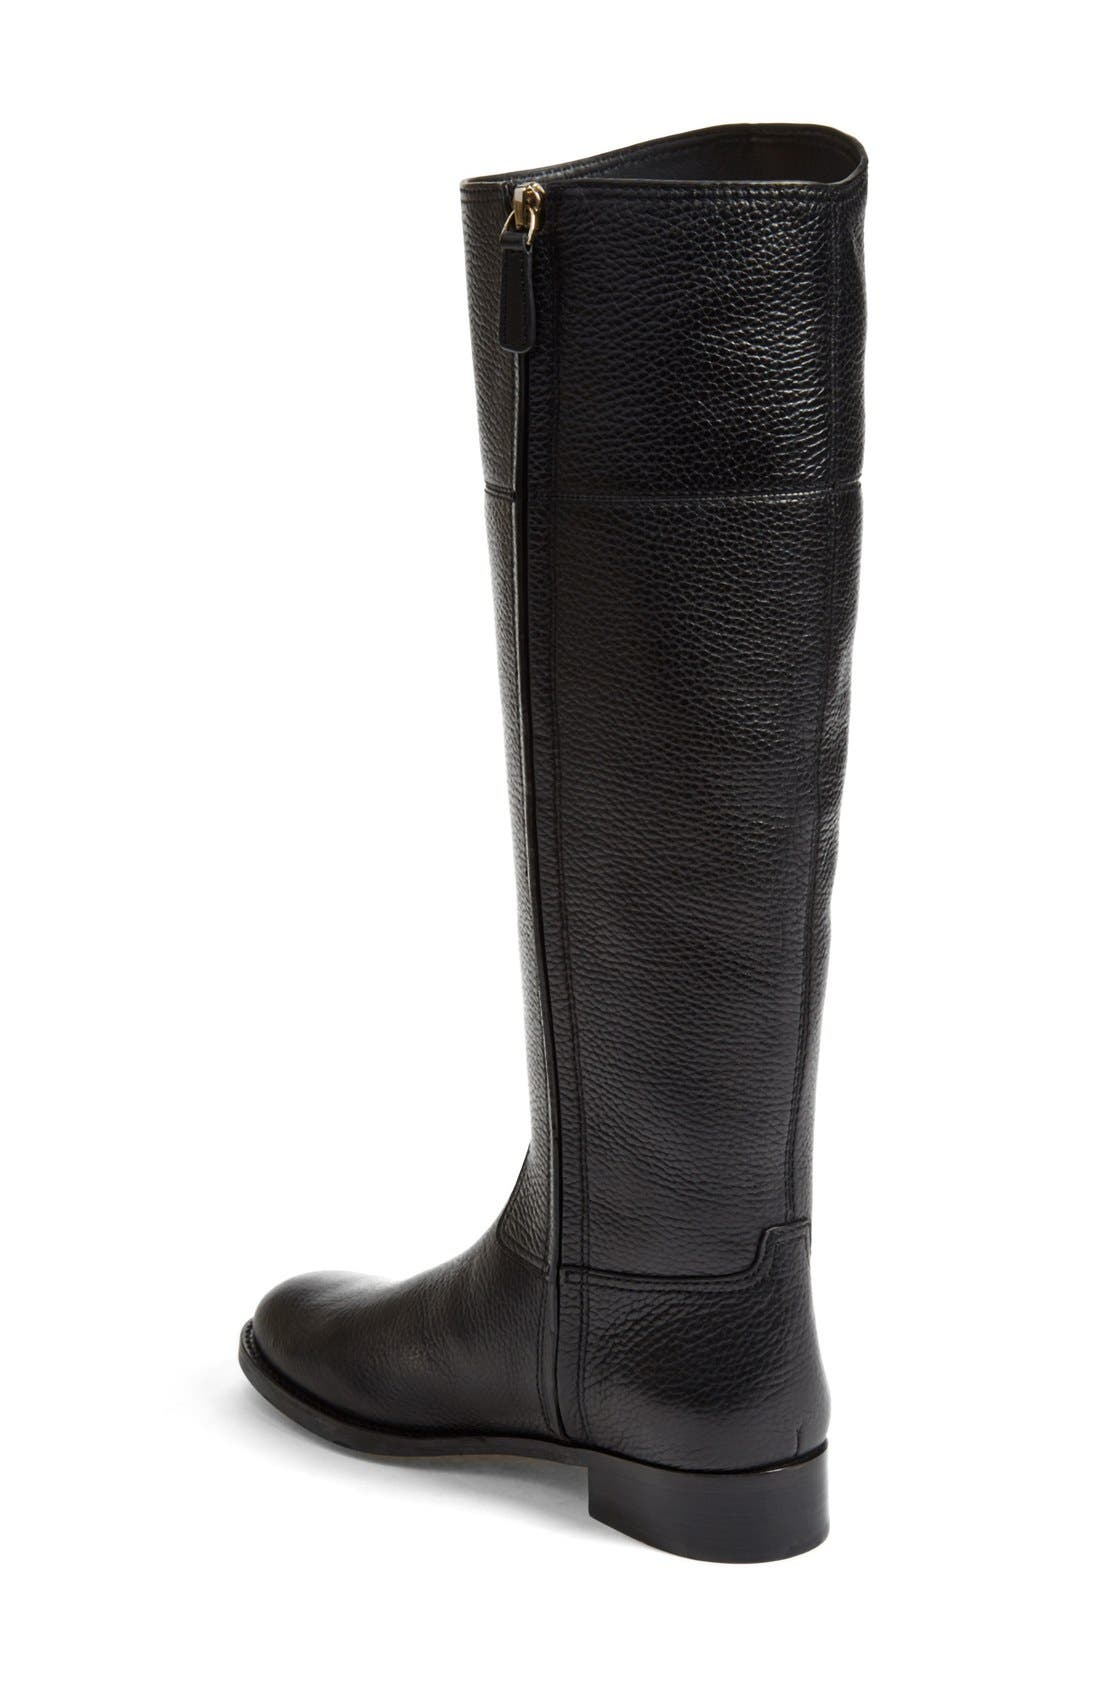 'Jolie' Riding Boot,                             Alternate thumbnail 2, color,                             Black Tumbled Leather